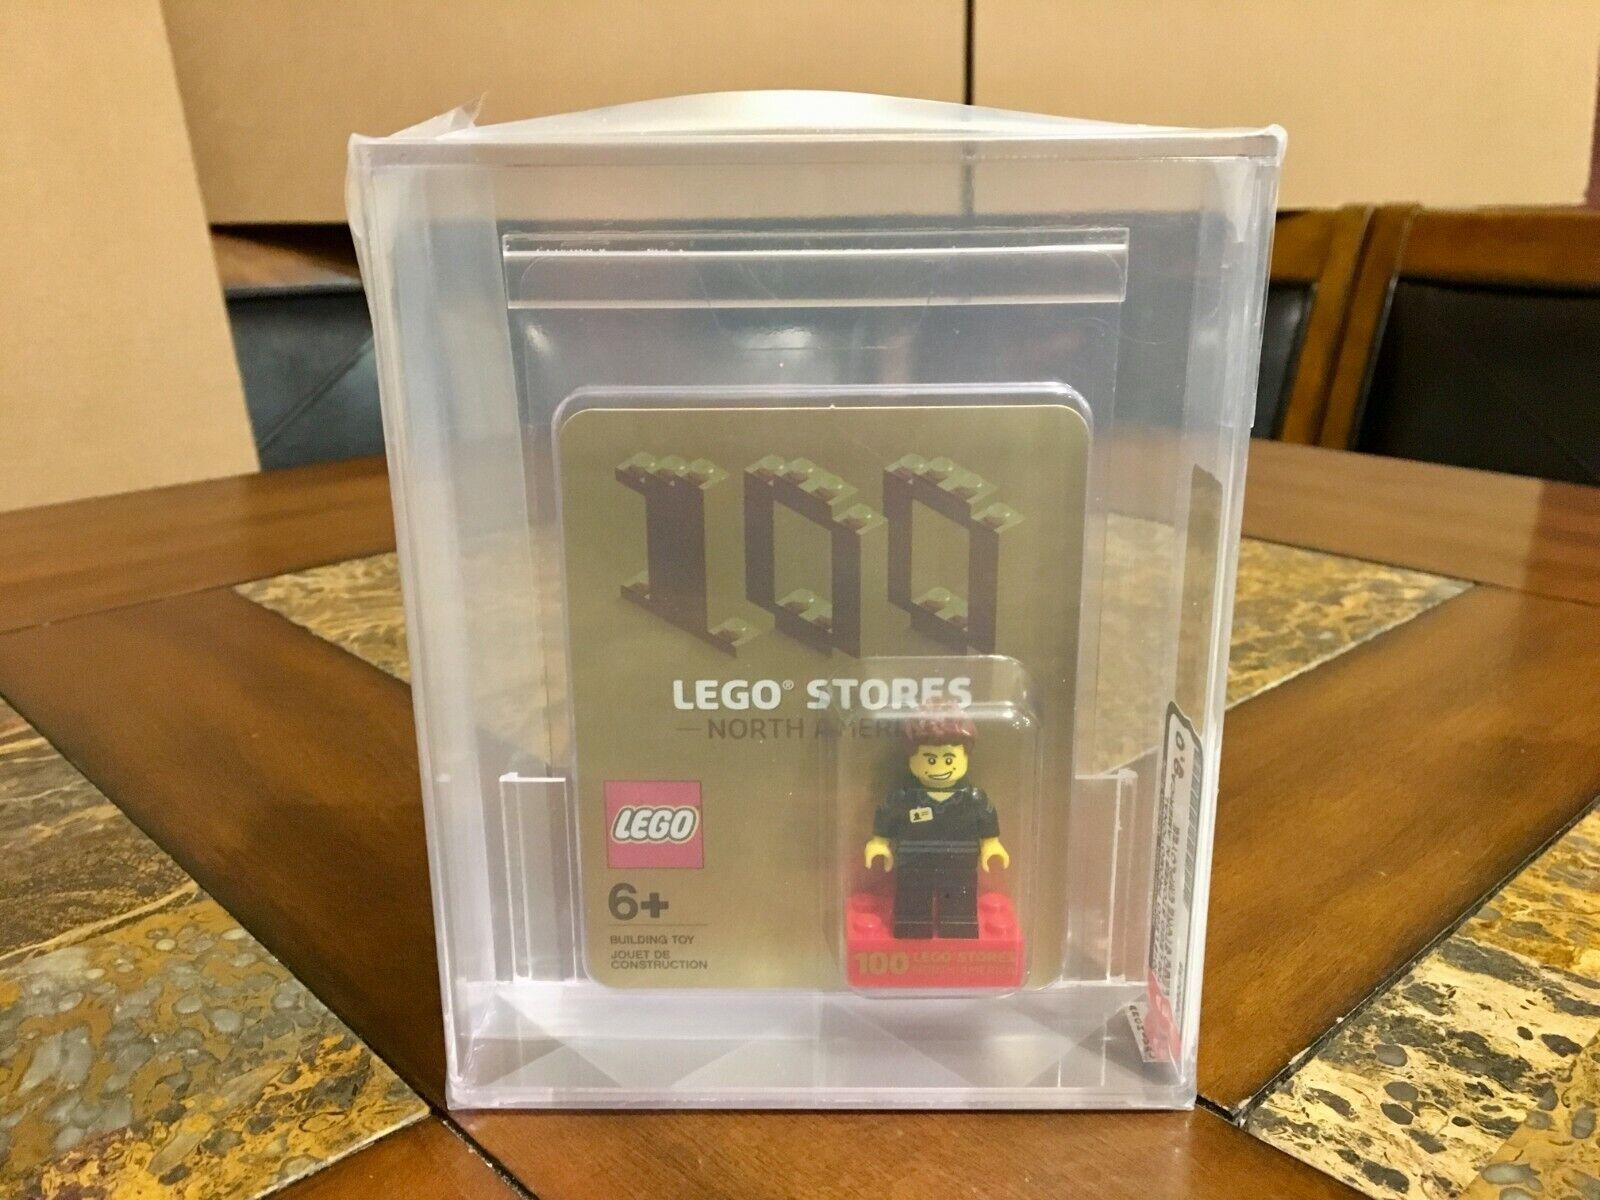 LEGO  EXCLUSIVE PROMOTIONAL 100 NORTH AMERICAN STORES nuovo AFA 9.0 VERY RARE   offrendo il 100%